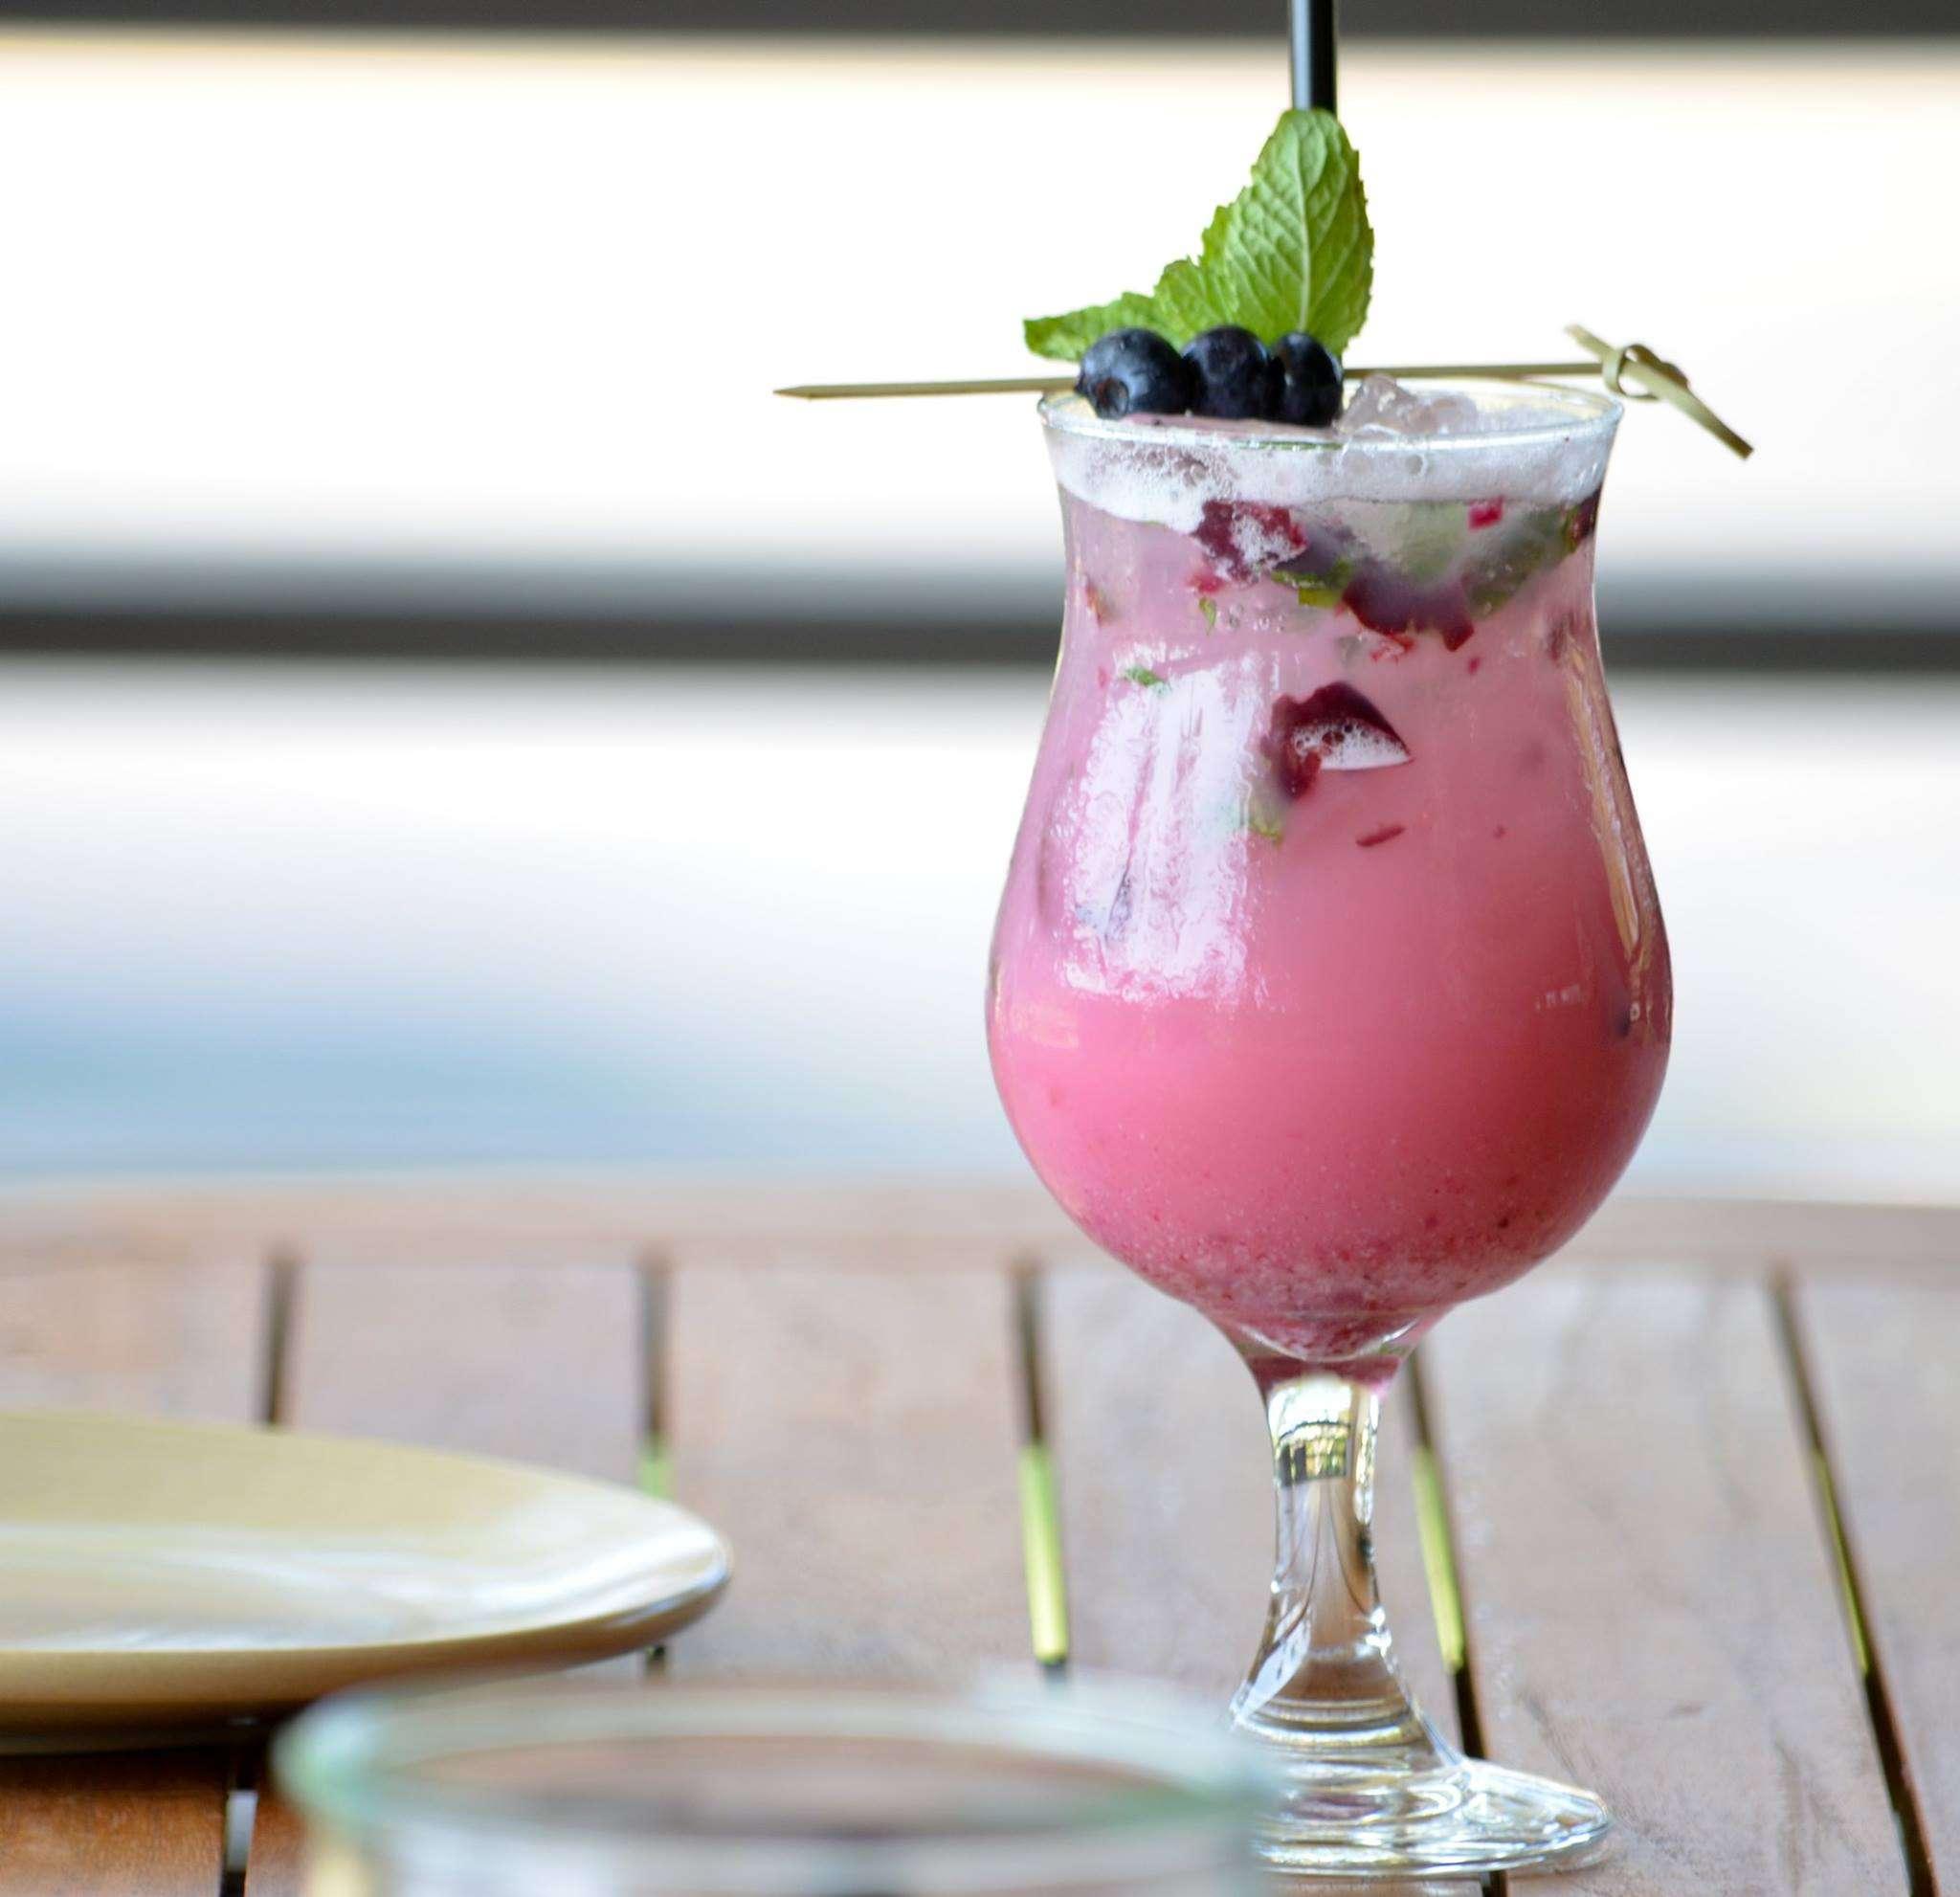 Fruit cocktail from Monkeypod